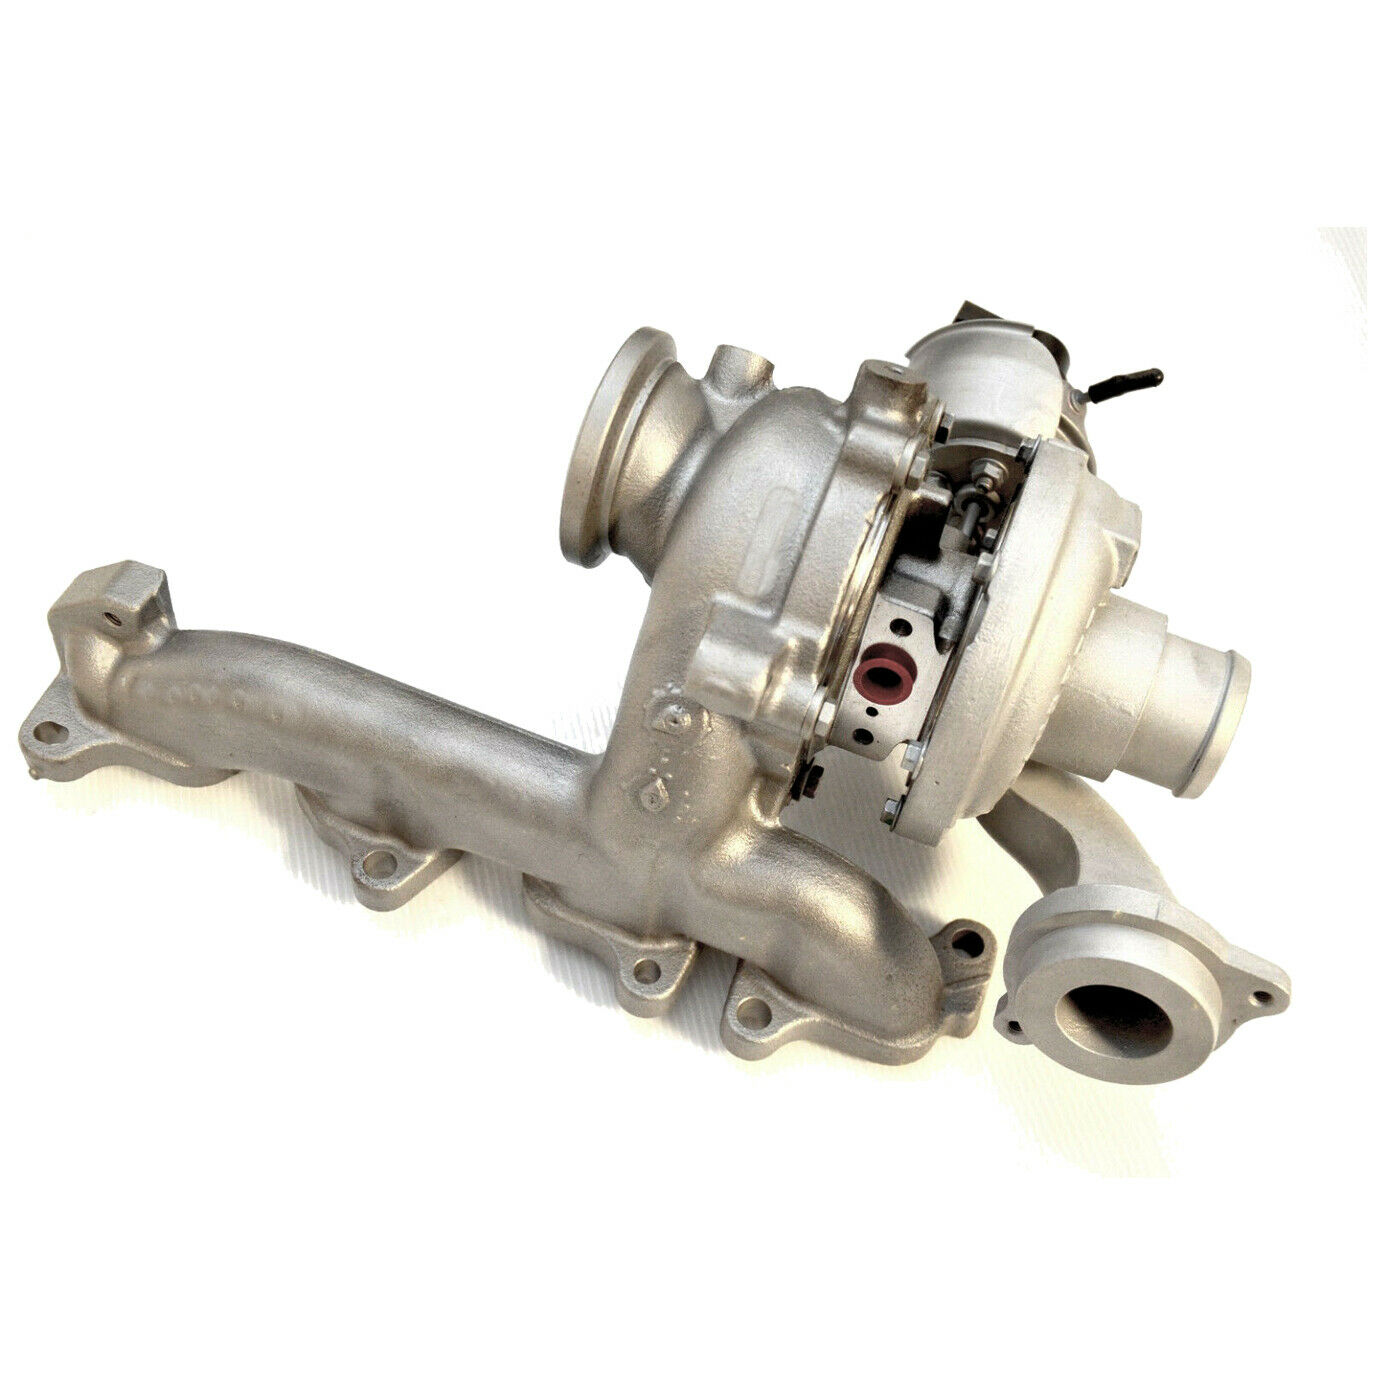 Turbosprężarka Turbo AP01 VW Crafter 30-35 30-50 Amarok 2.0 TDI CKTC CKTB CNFA 803955 803955-0003 803955-5005S 803955-0005